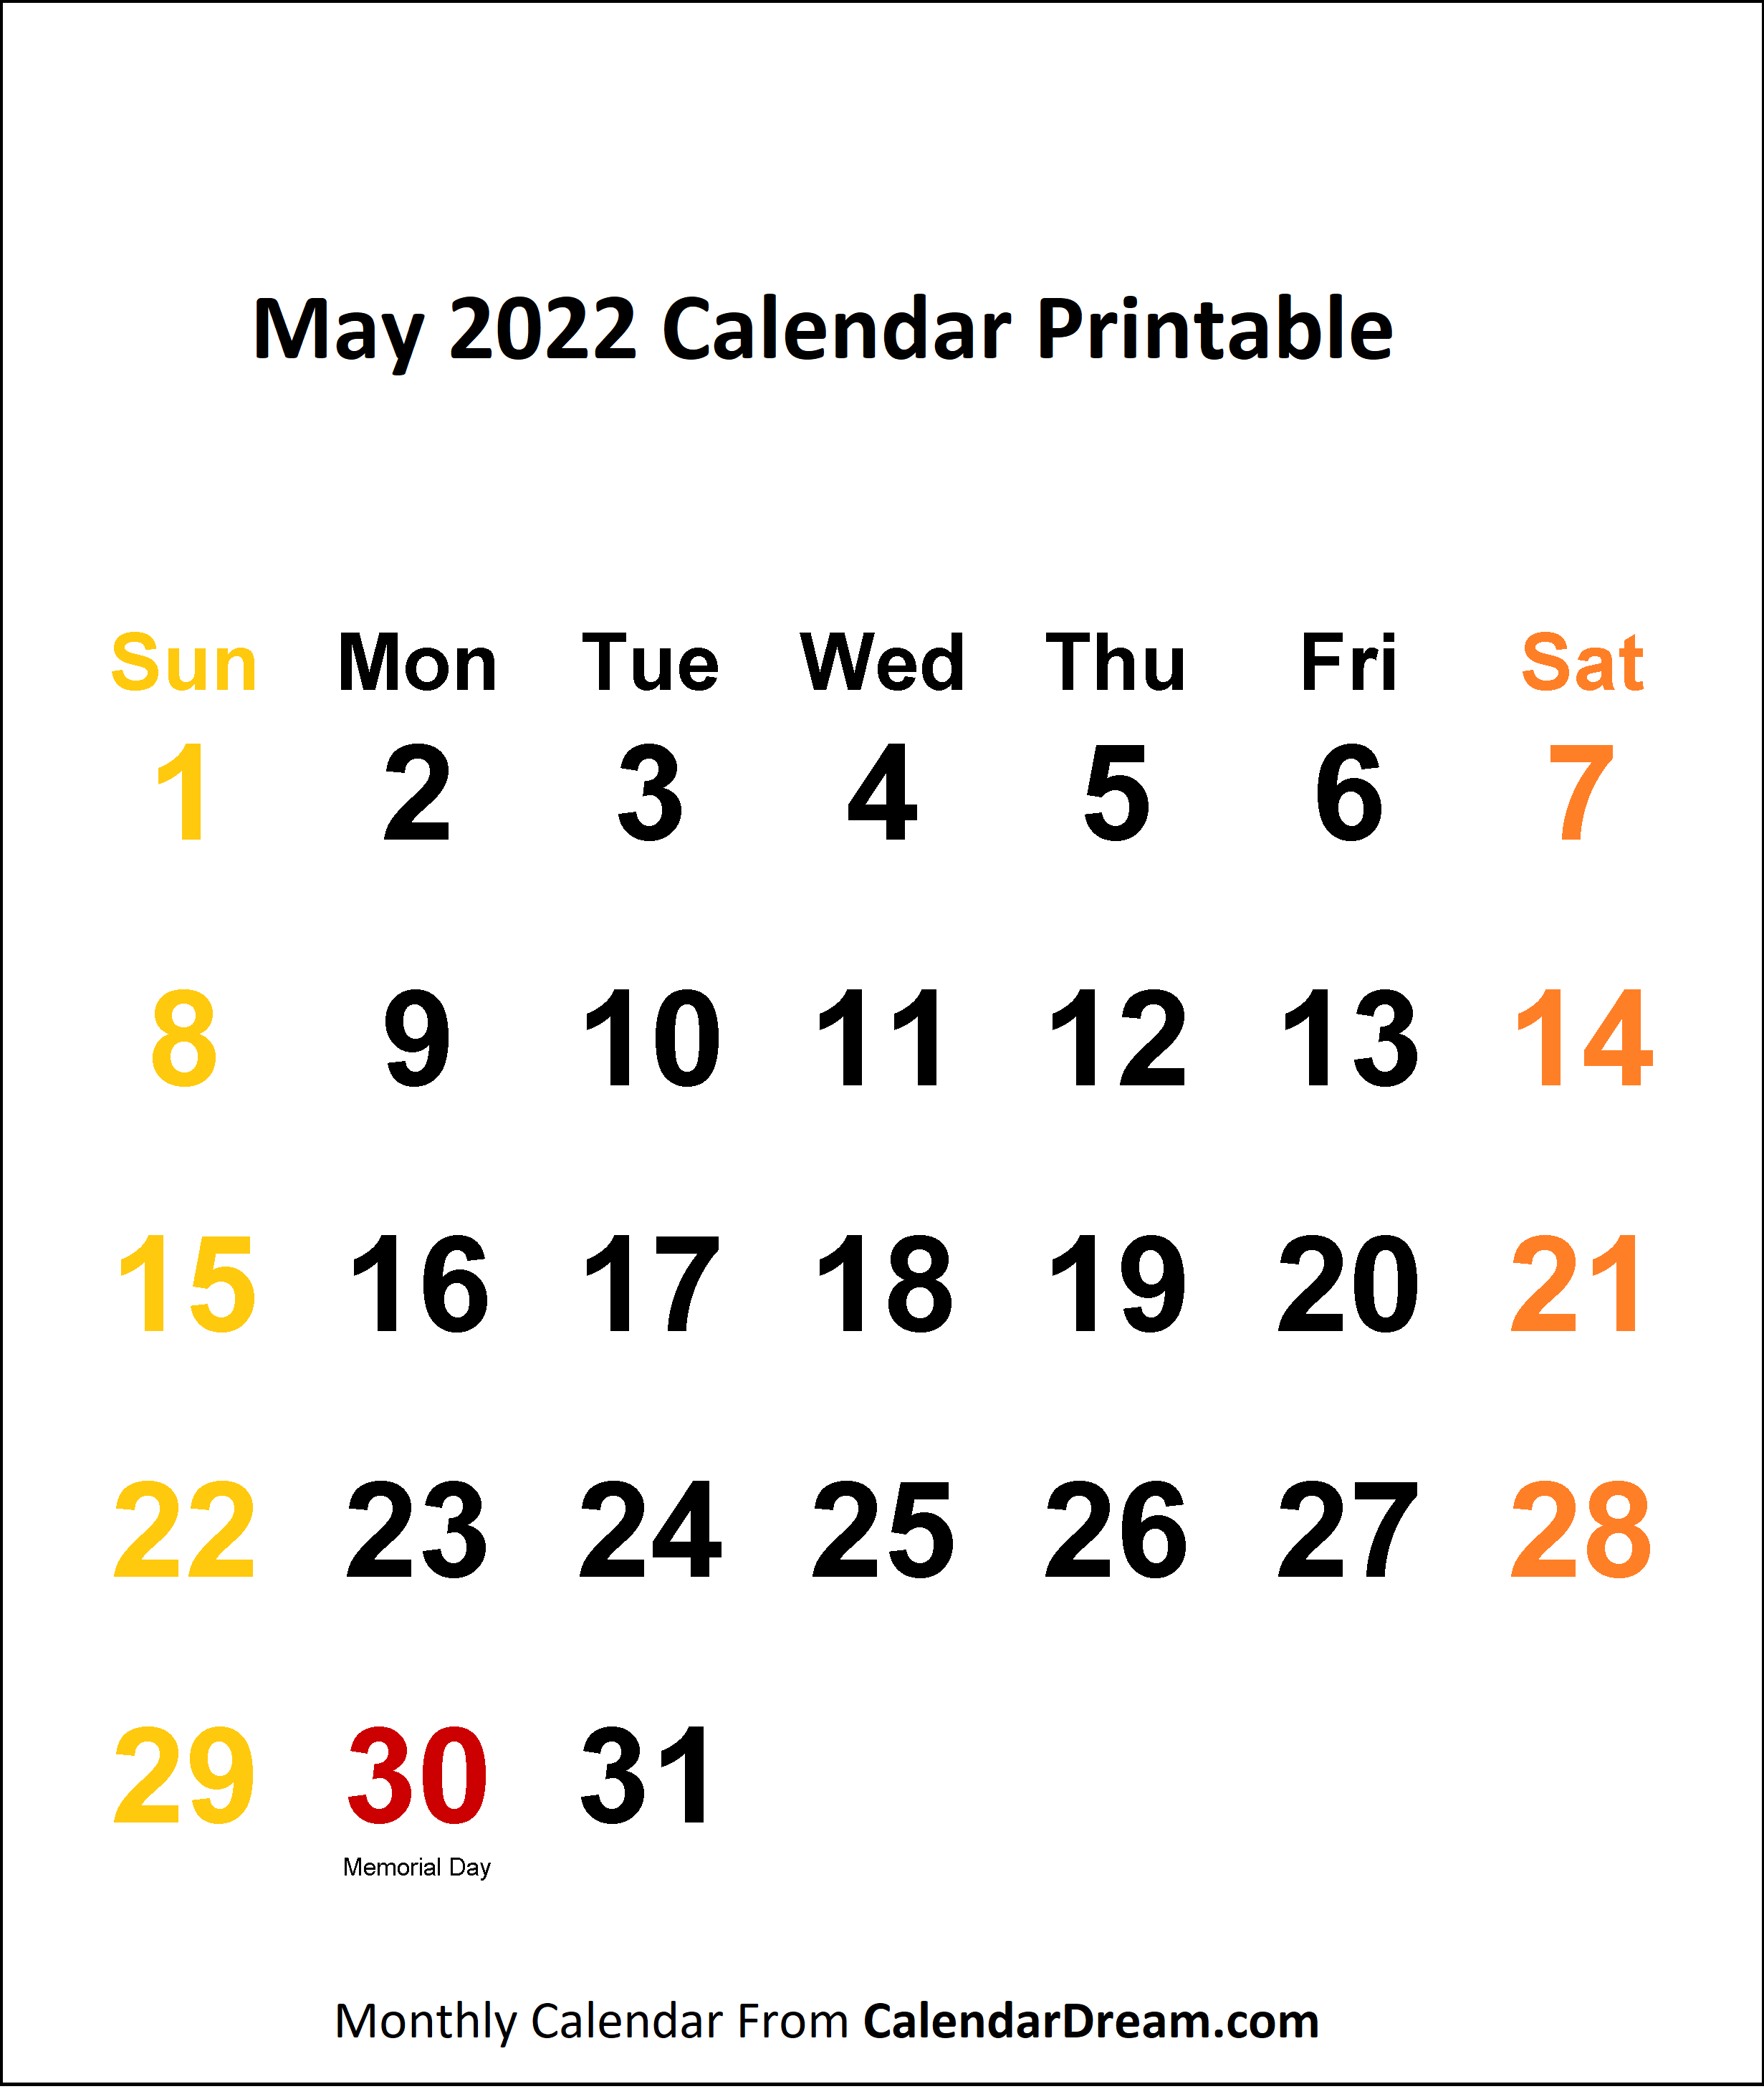 May 2022 Calendar Printable